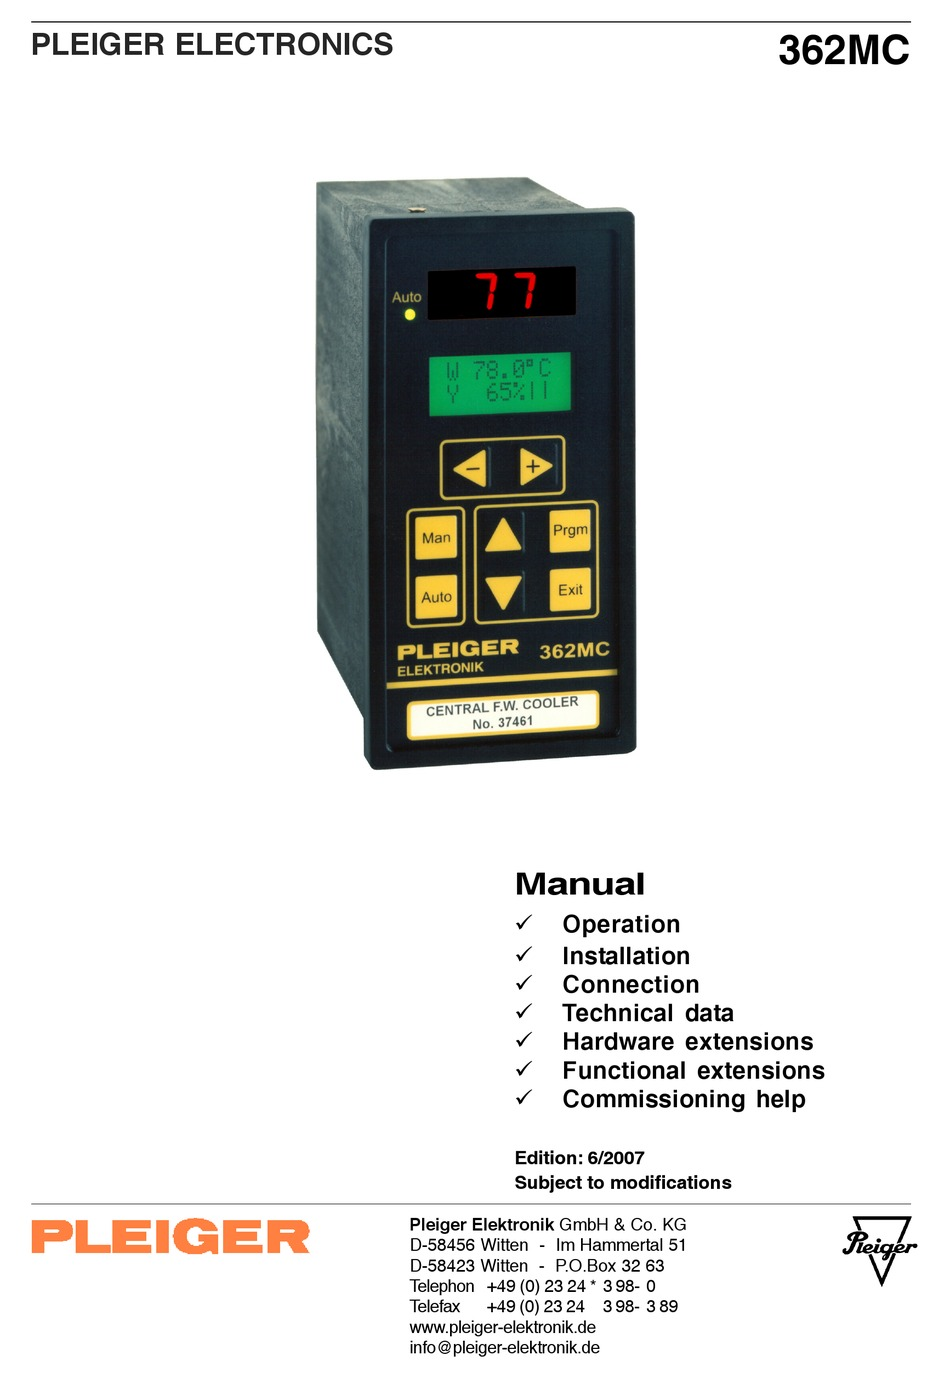 Pleiger elektronik 362mc multi function controller 9362000000